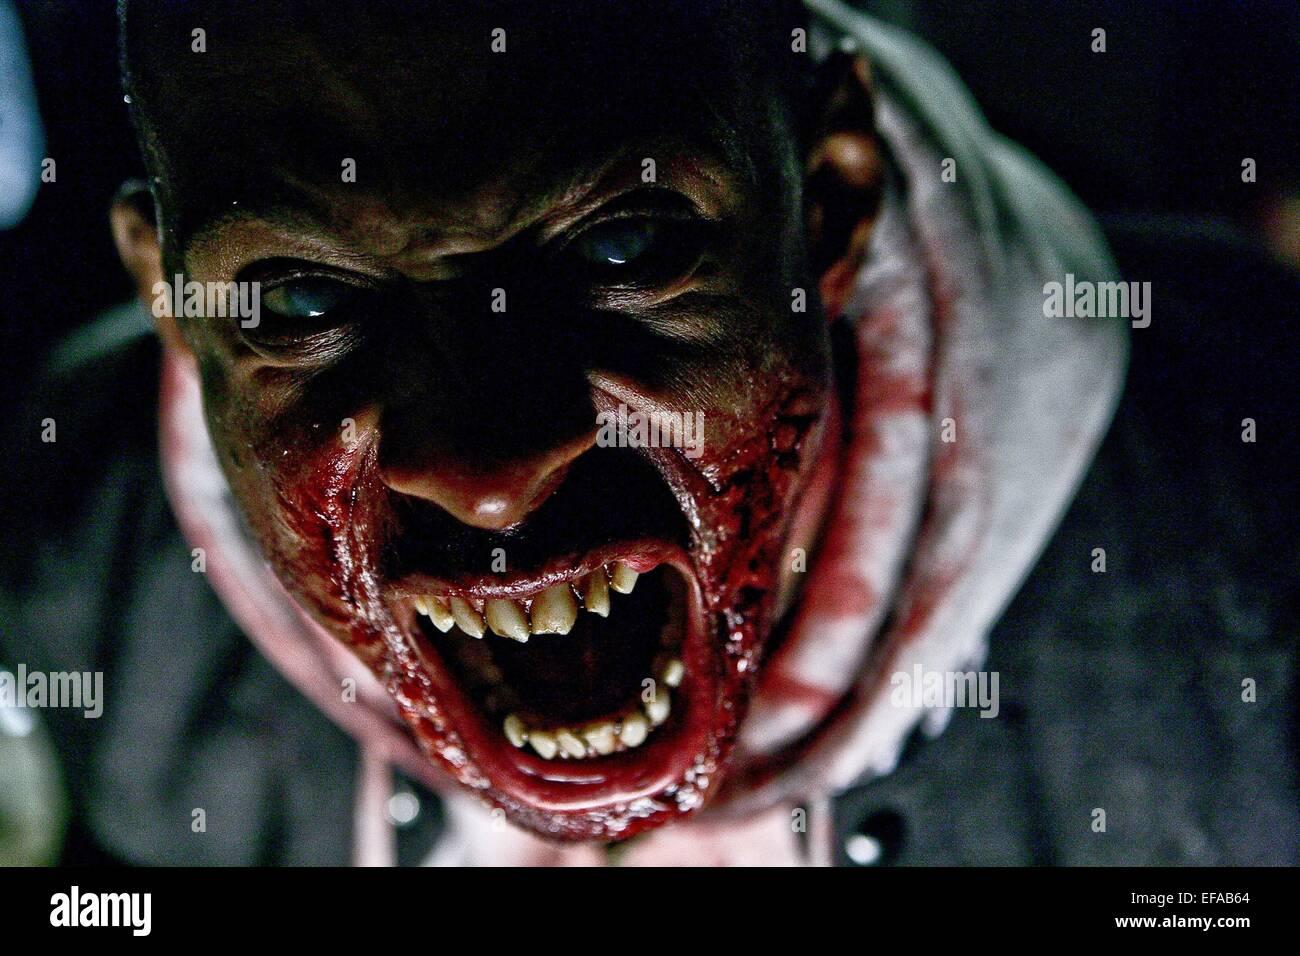 ZOMBIE THE HORDE (2009) - Stock Image